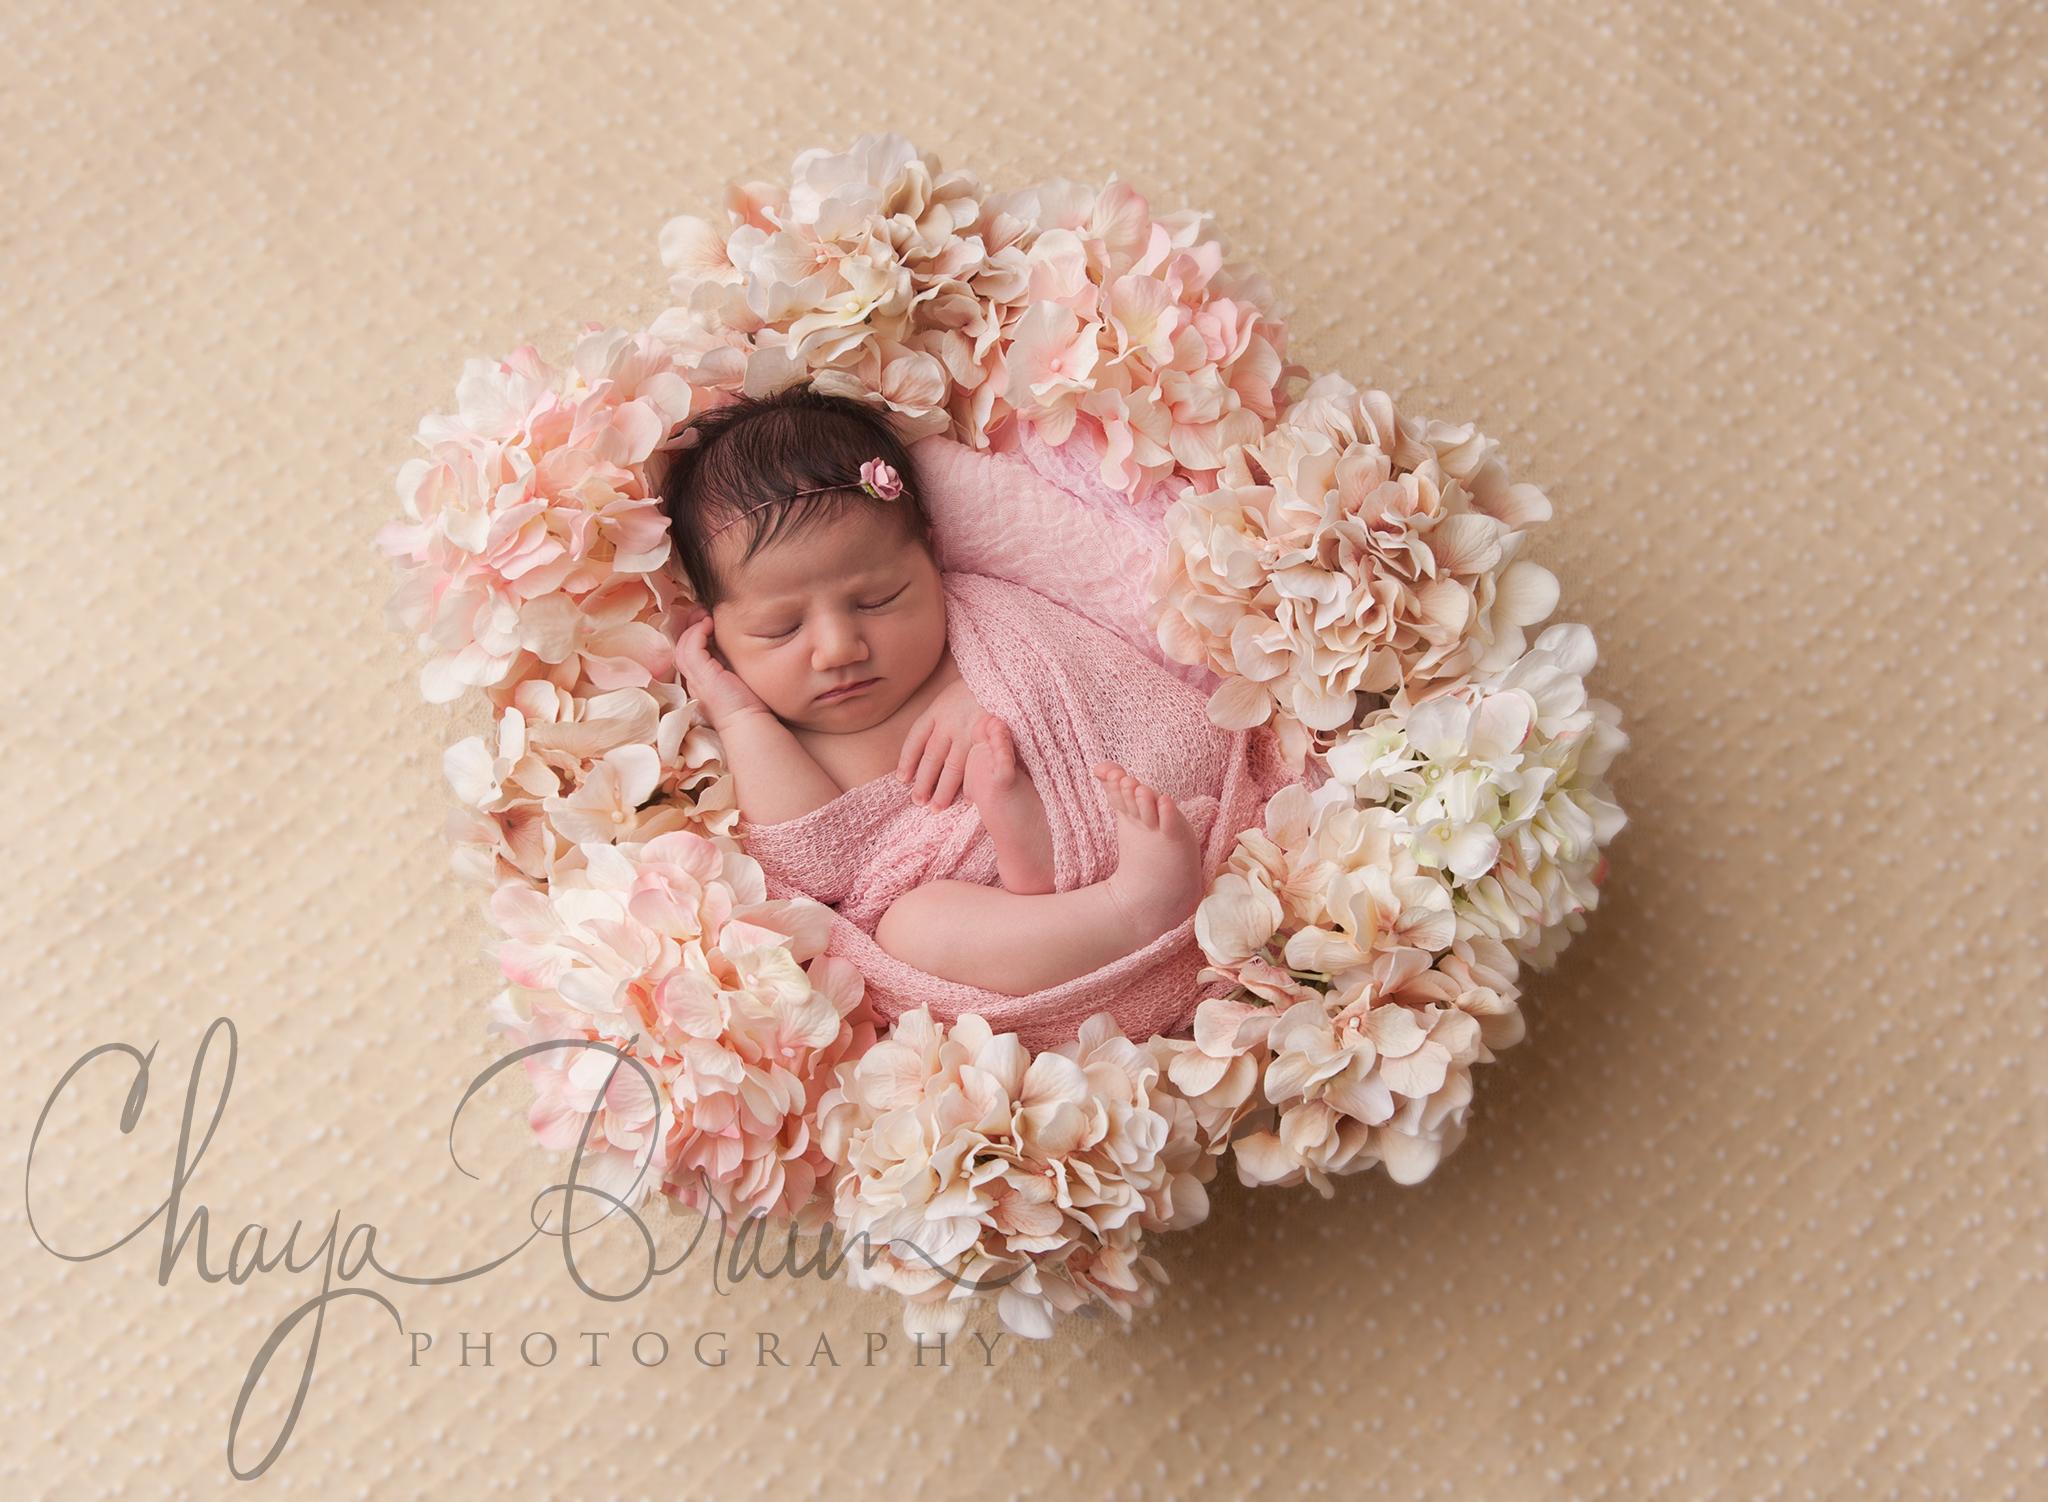 beautiful baby girl | chaya braun photography